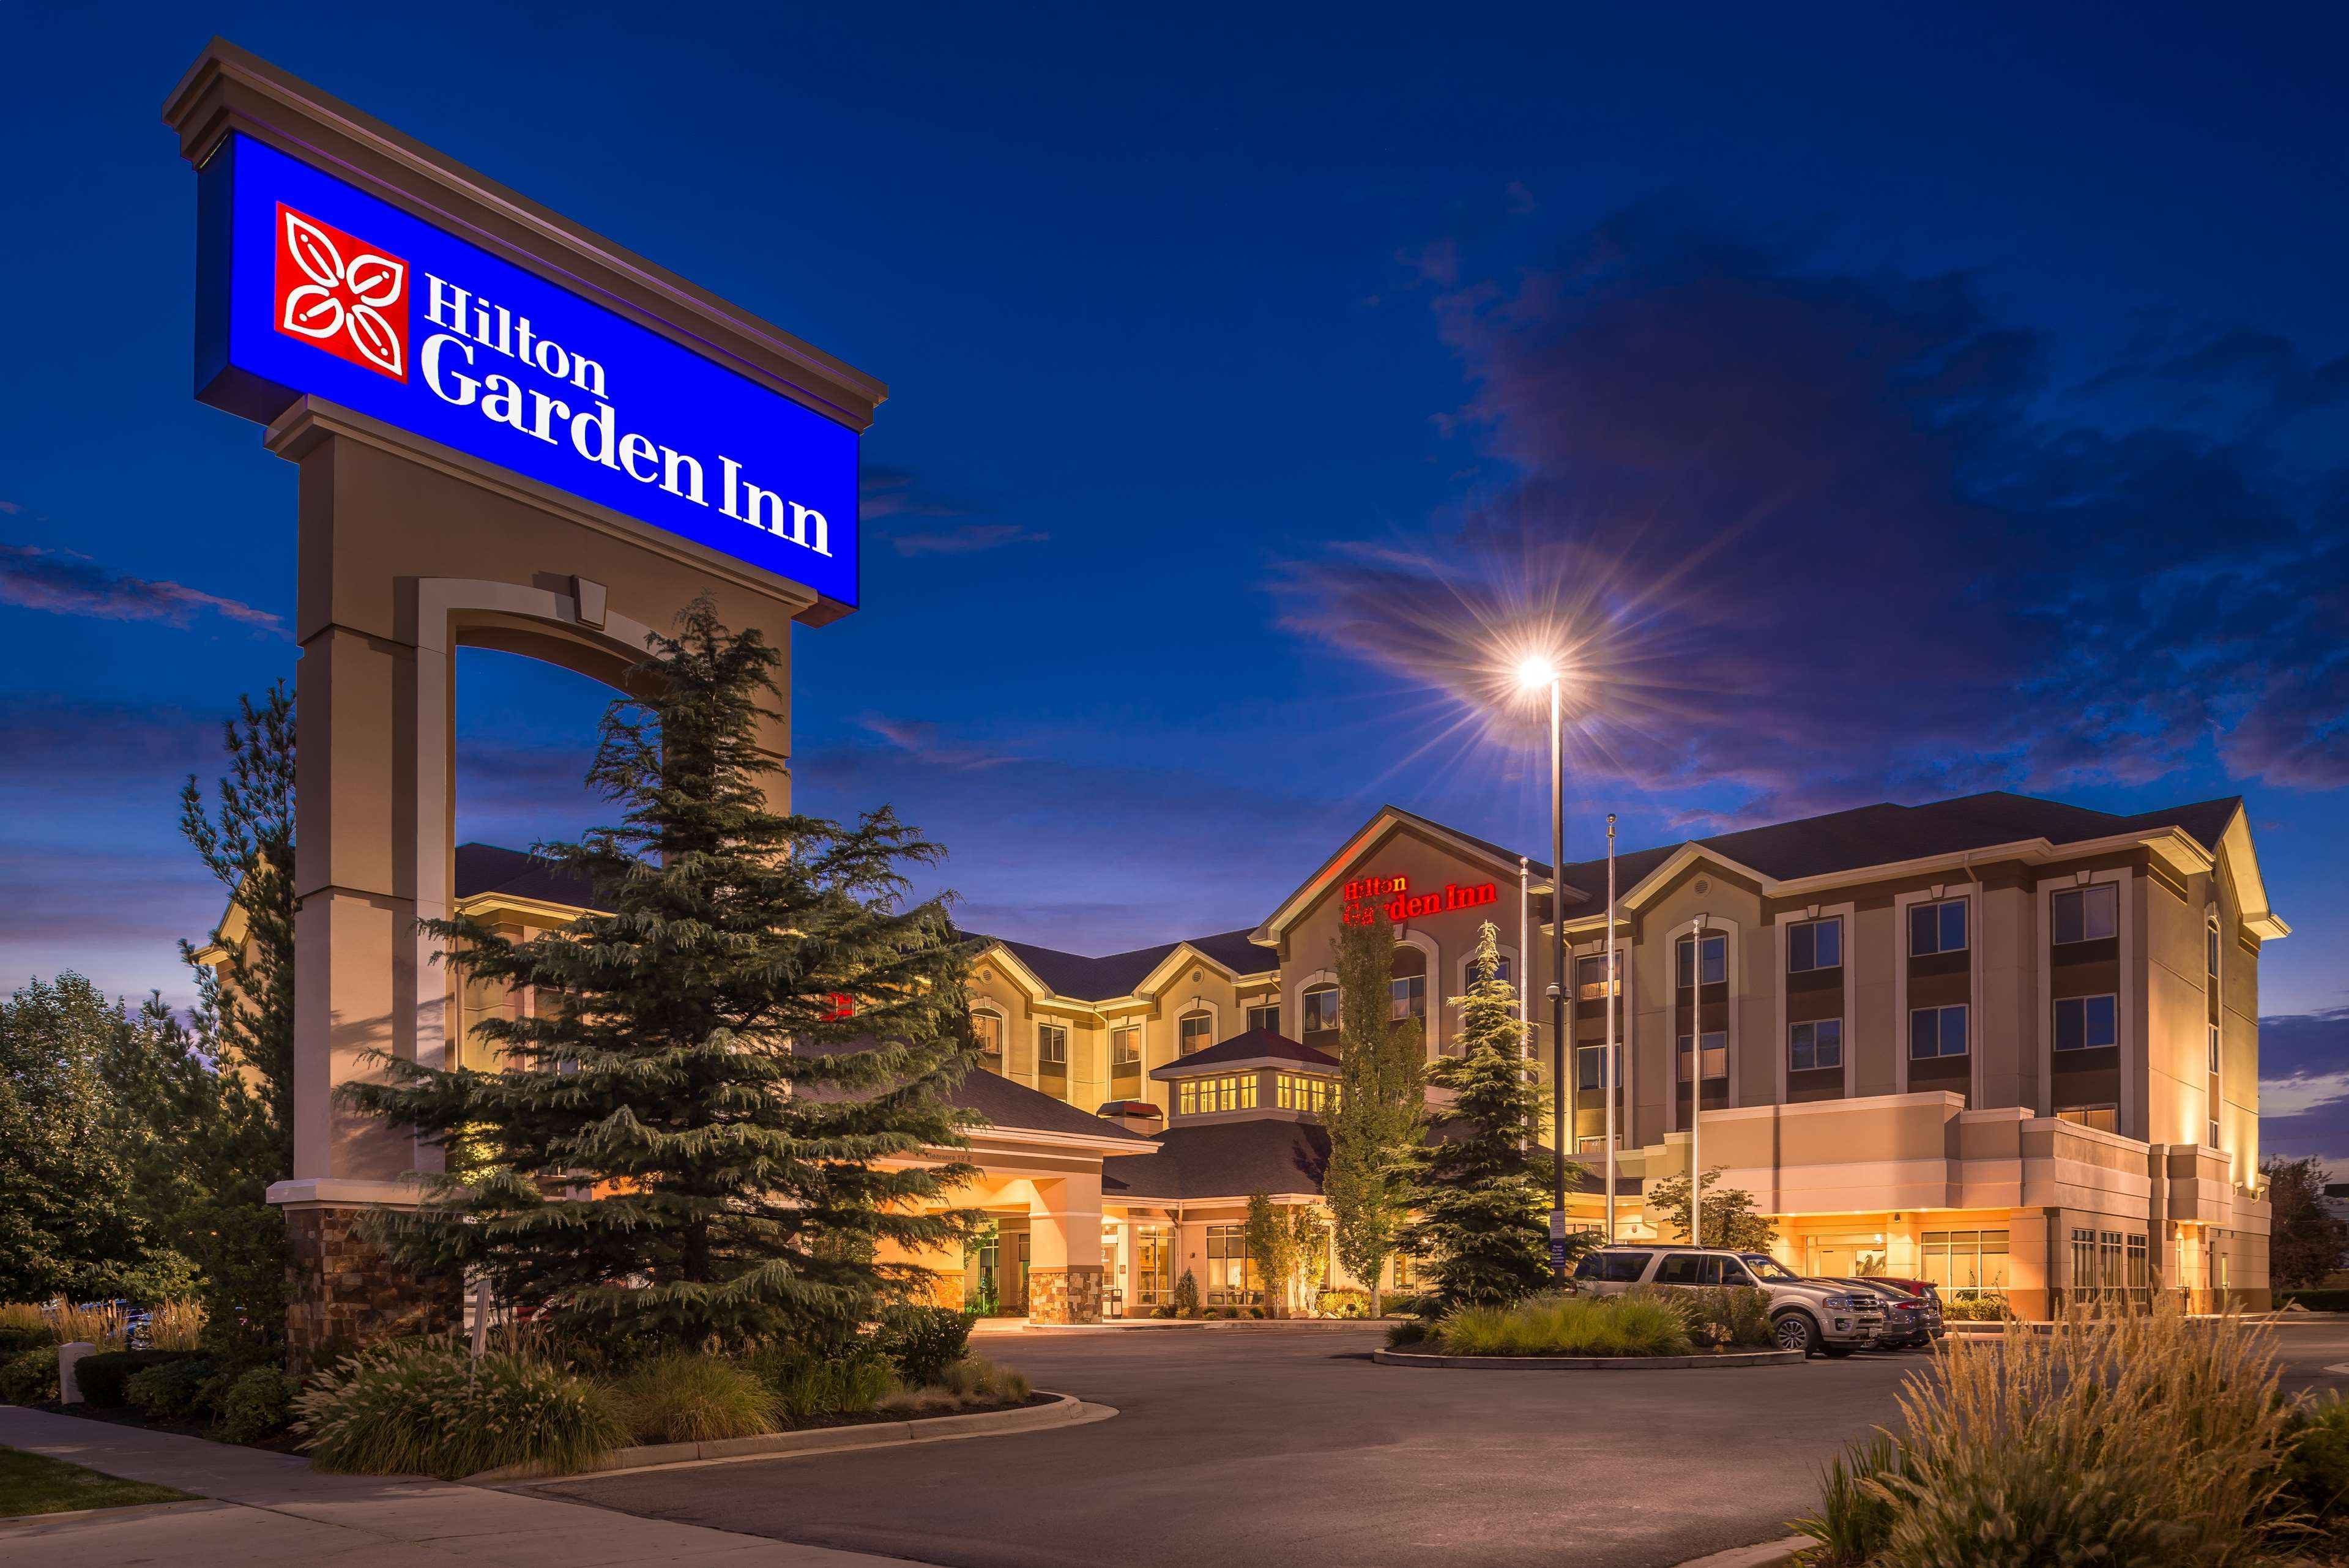 Hilton Garden Inn Salt Lake City Downtown image 6